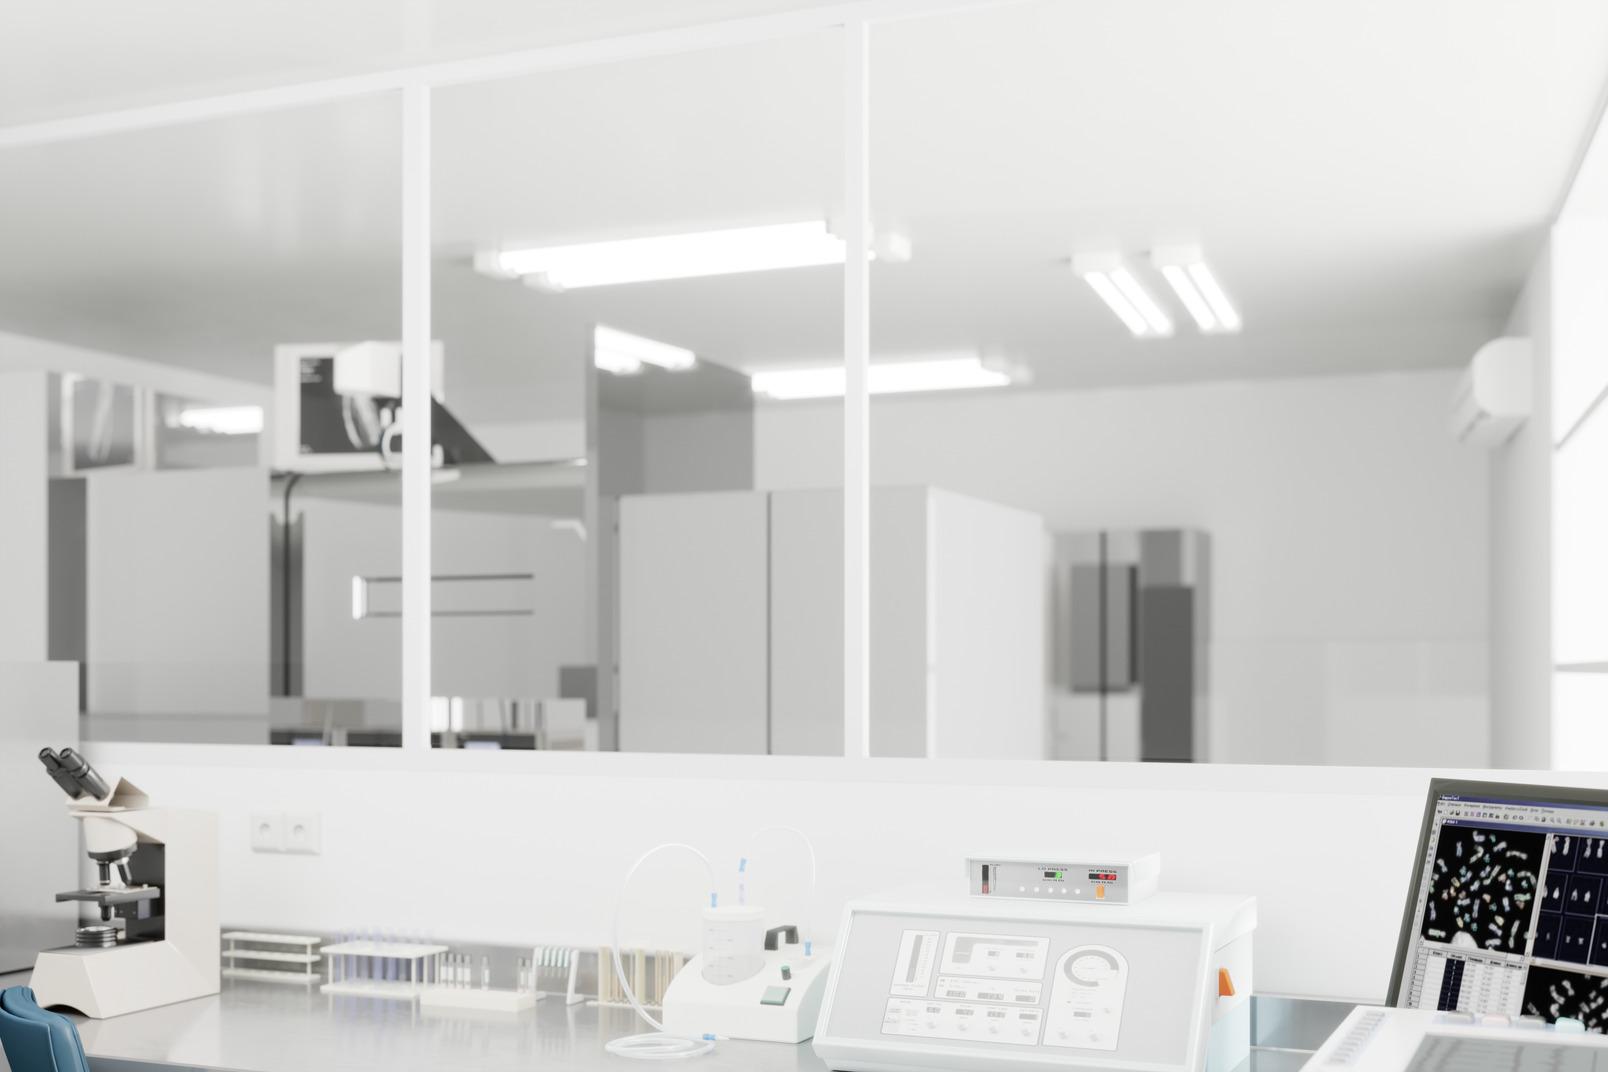 Medical laboratory room